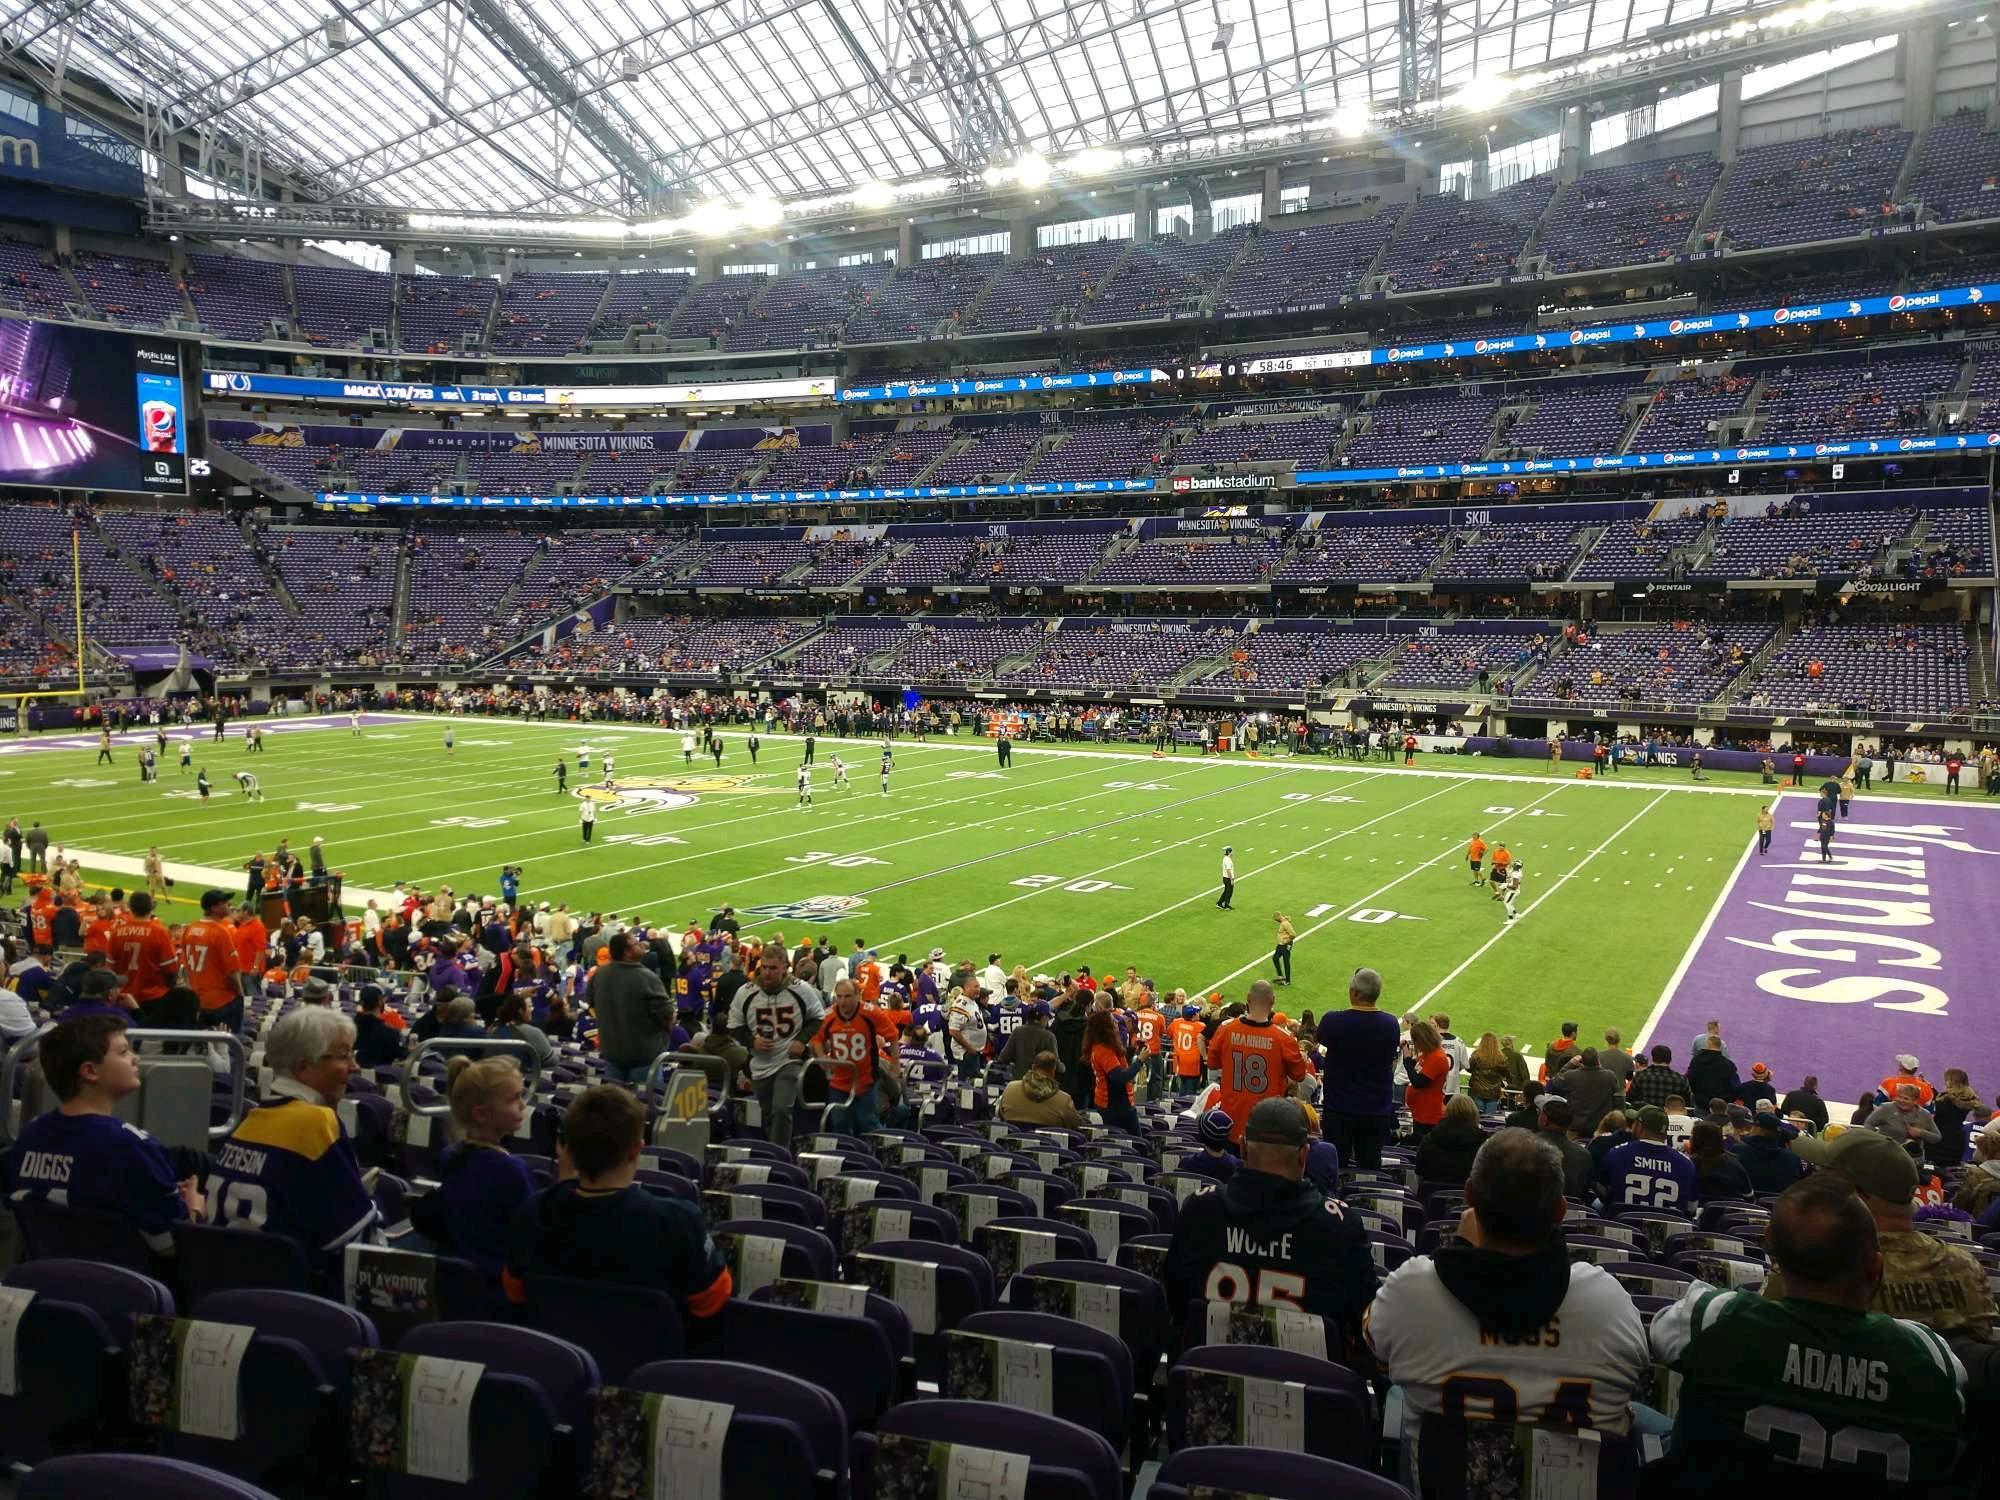 U.S. Bank Stadium Section 105 Row 24 Seat 8